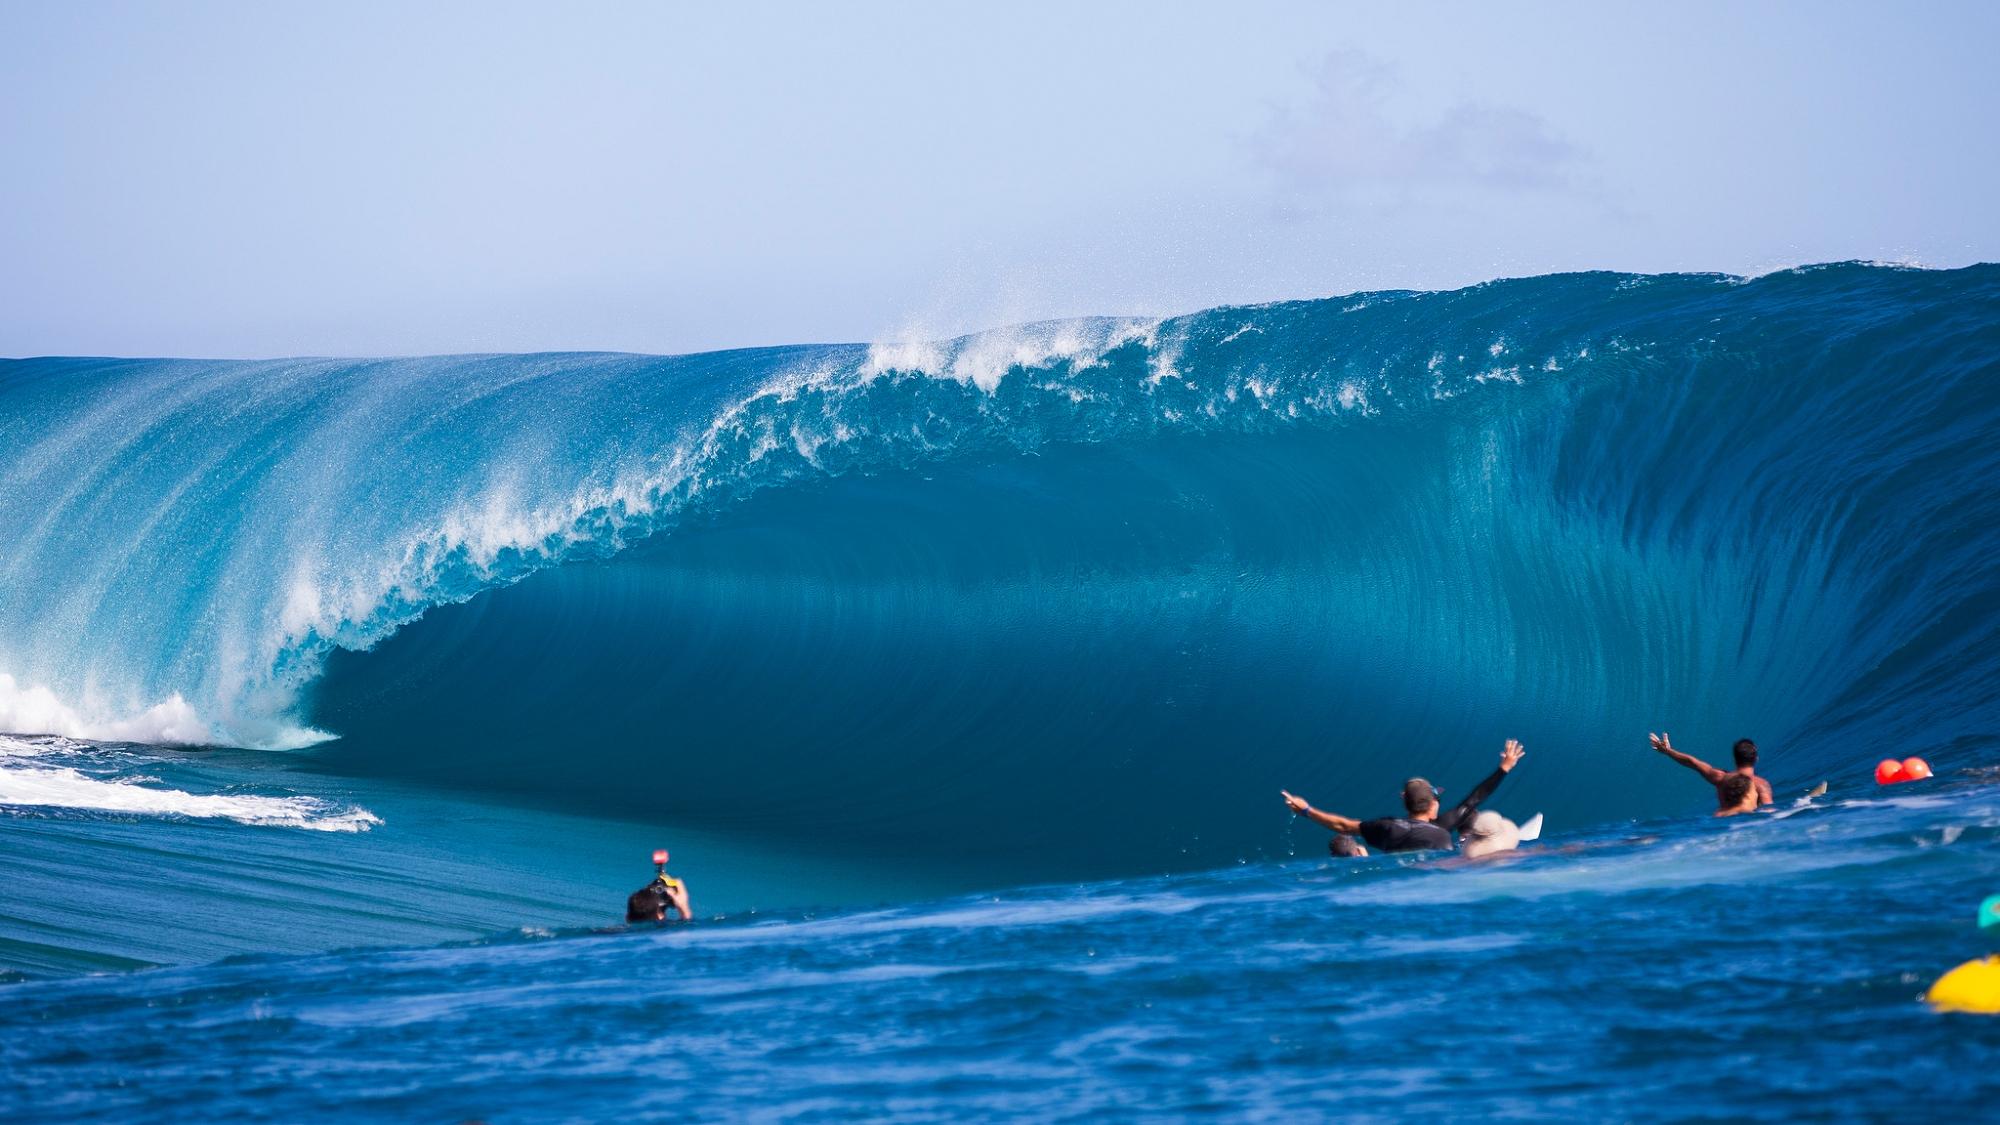 polski surfer